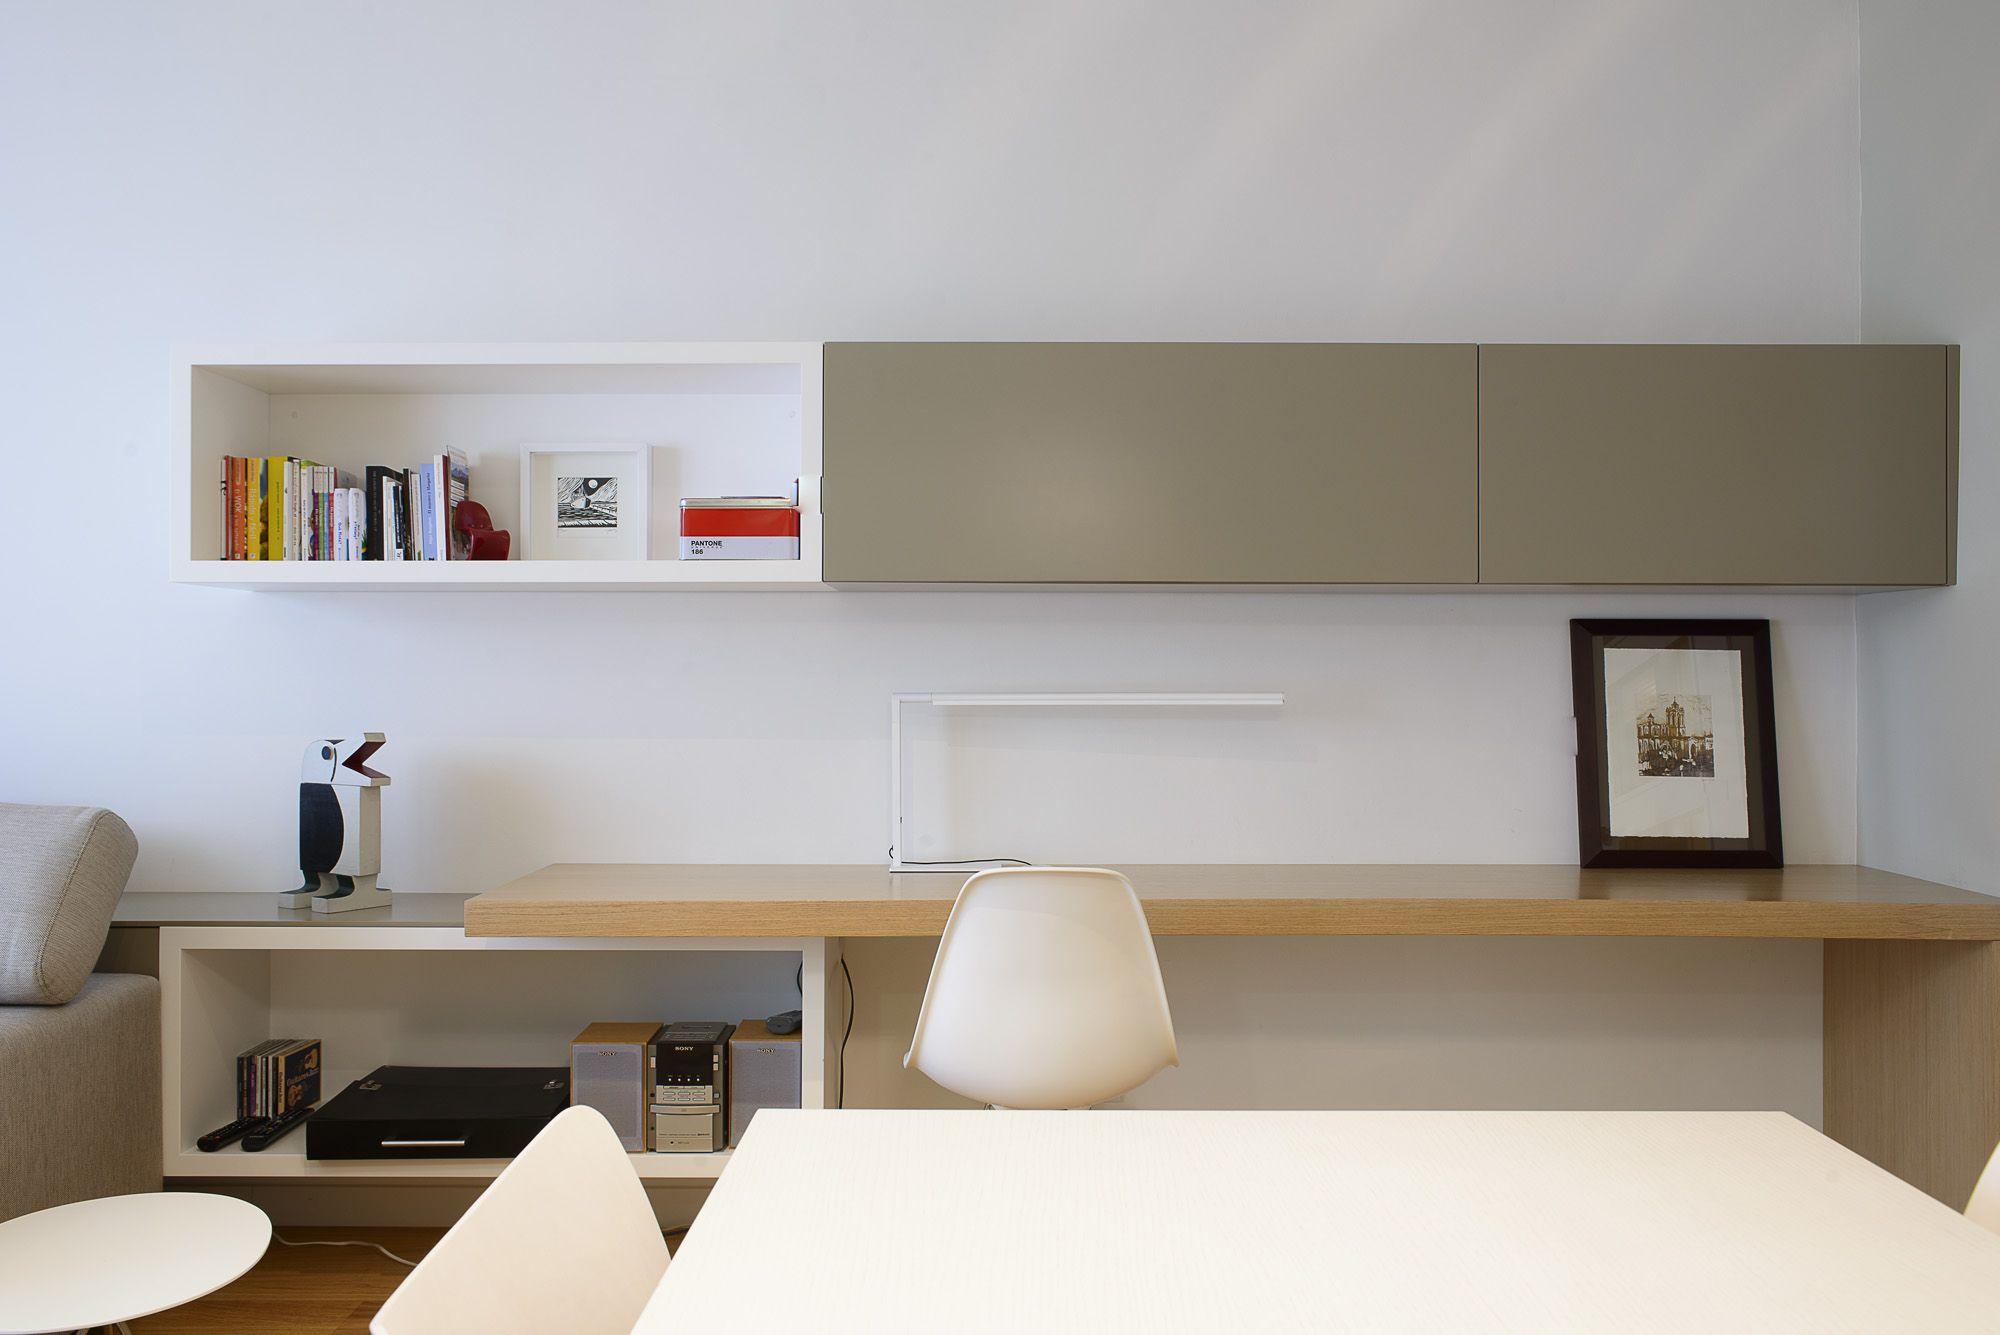 Comedor Estudio Salon Contemporaneo Decoracion Via  # Muebles Kazzano Que Opinion Teneis